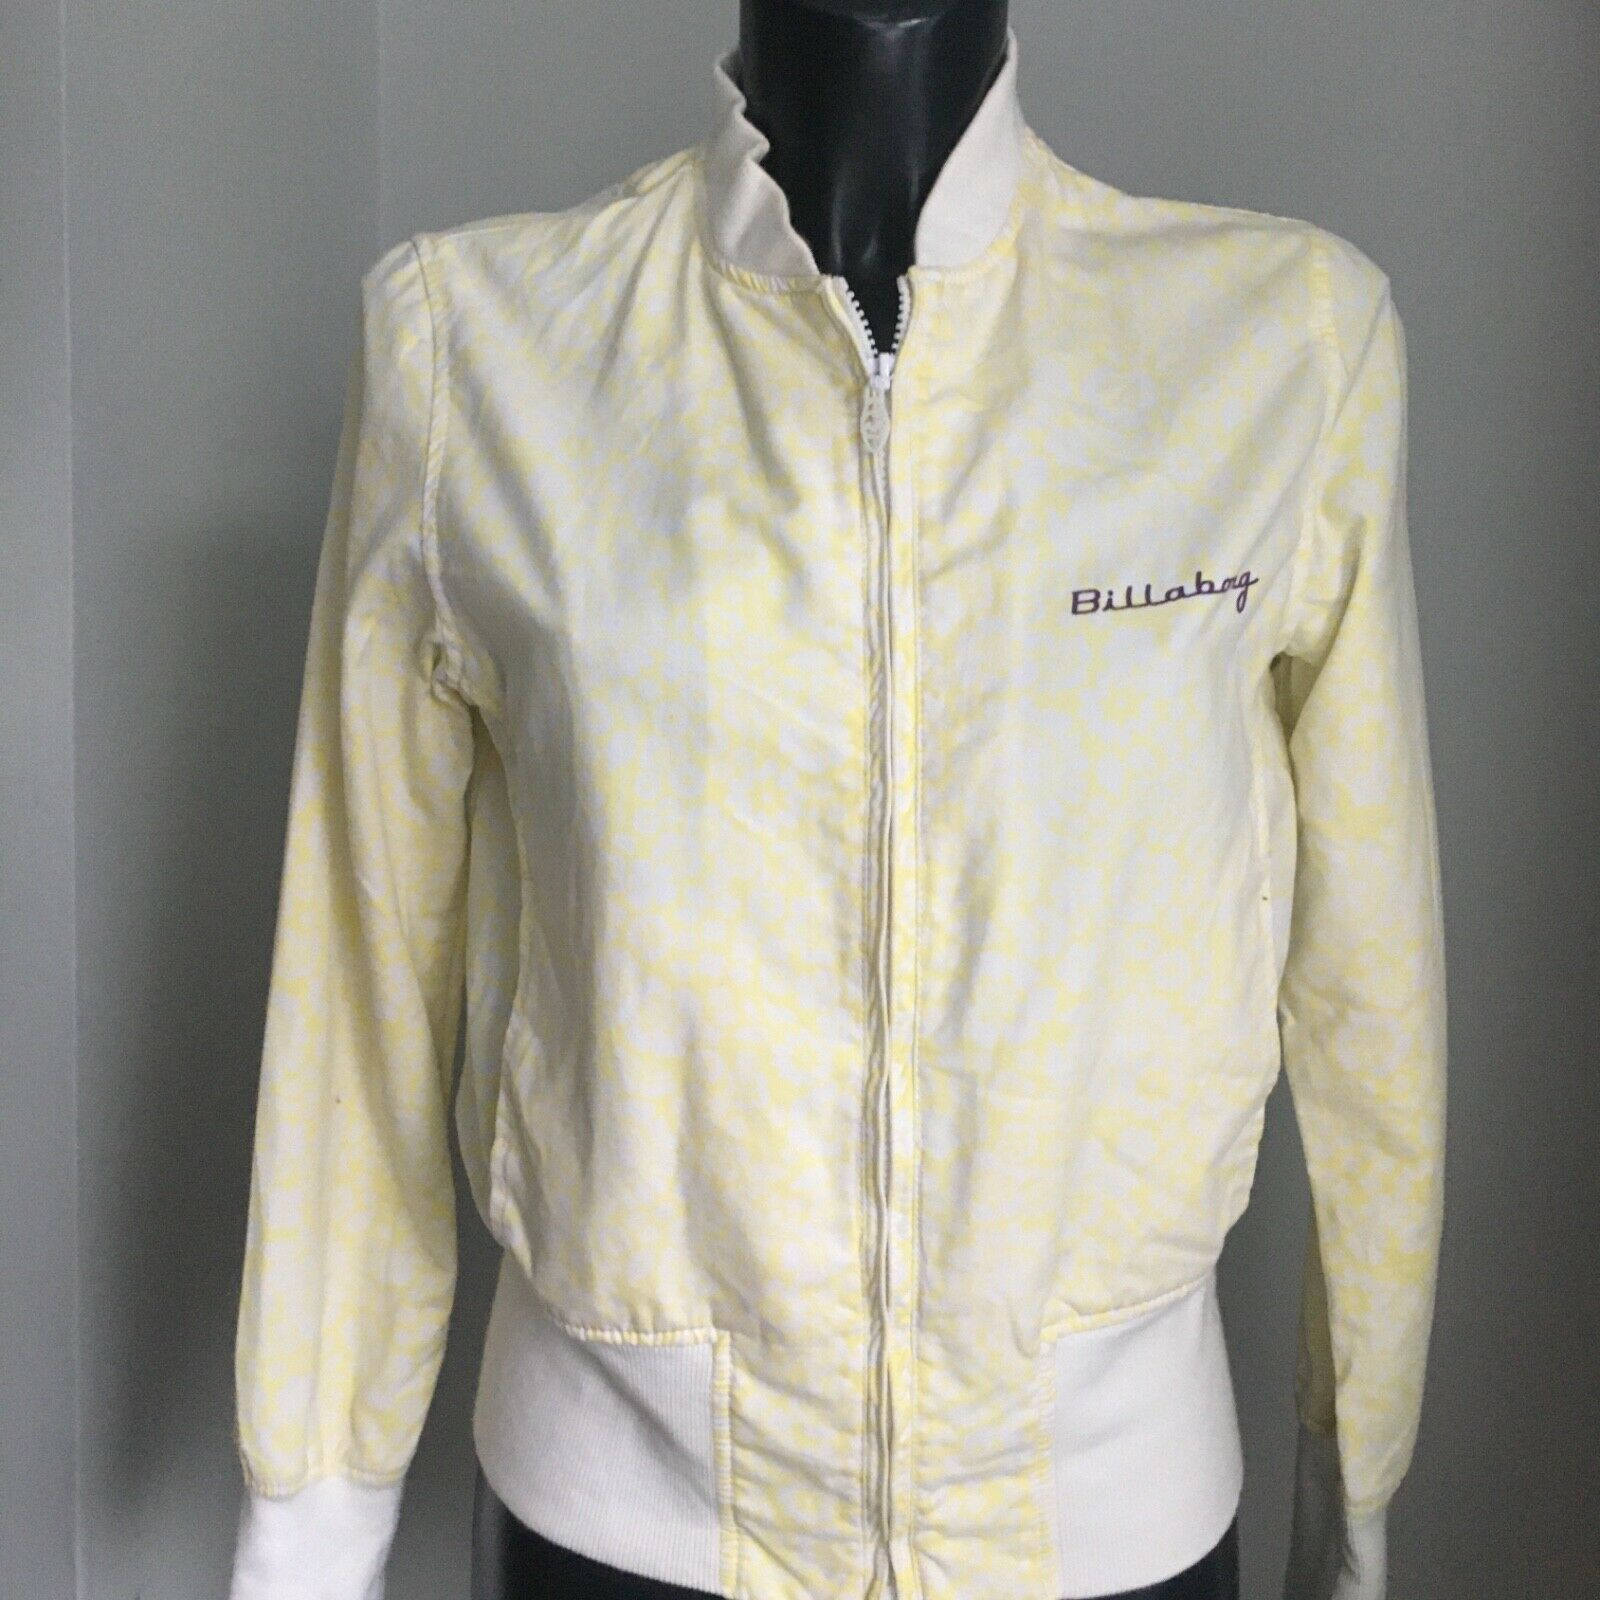 BILLABONG JACKET Light Womens Medium Uk 12 Lemon Yellow Coat Surf